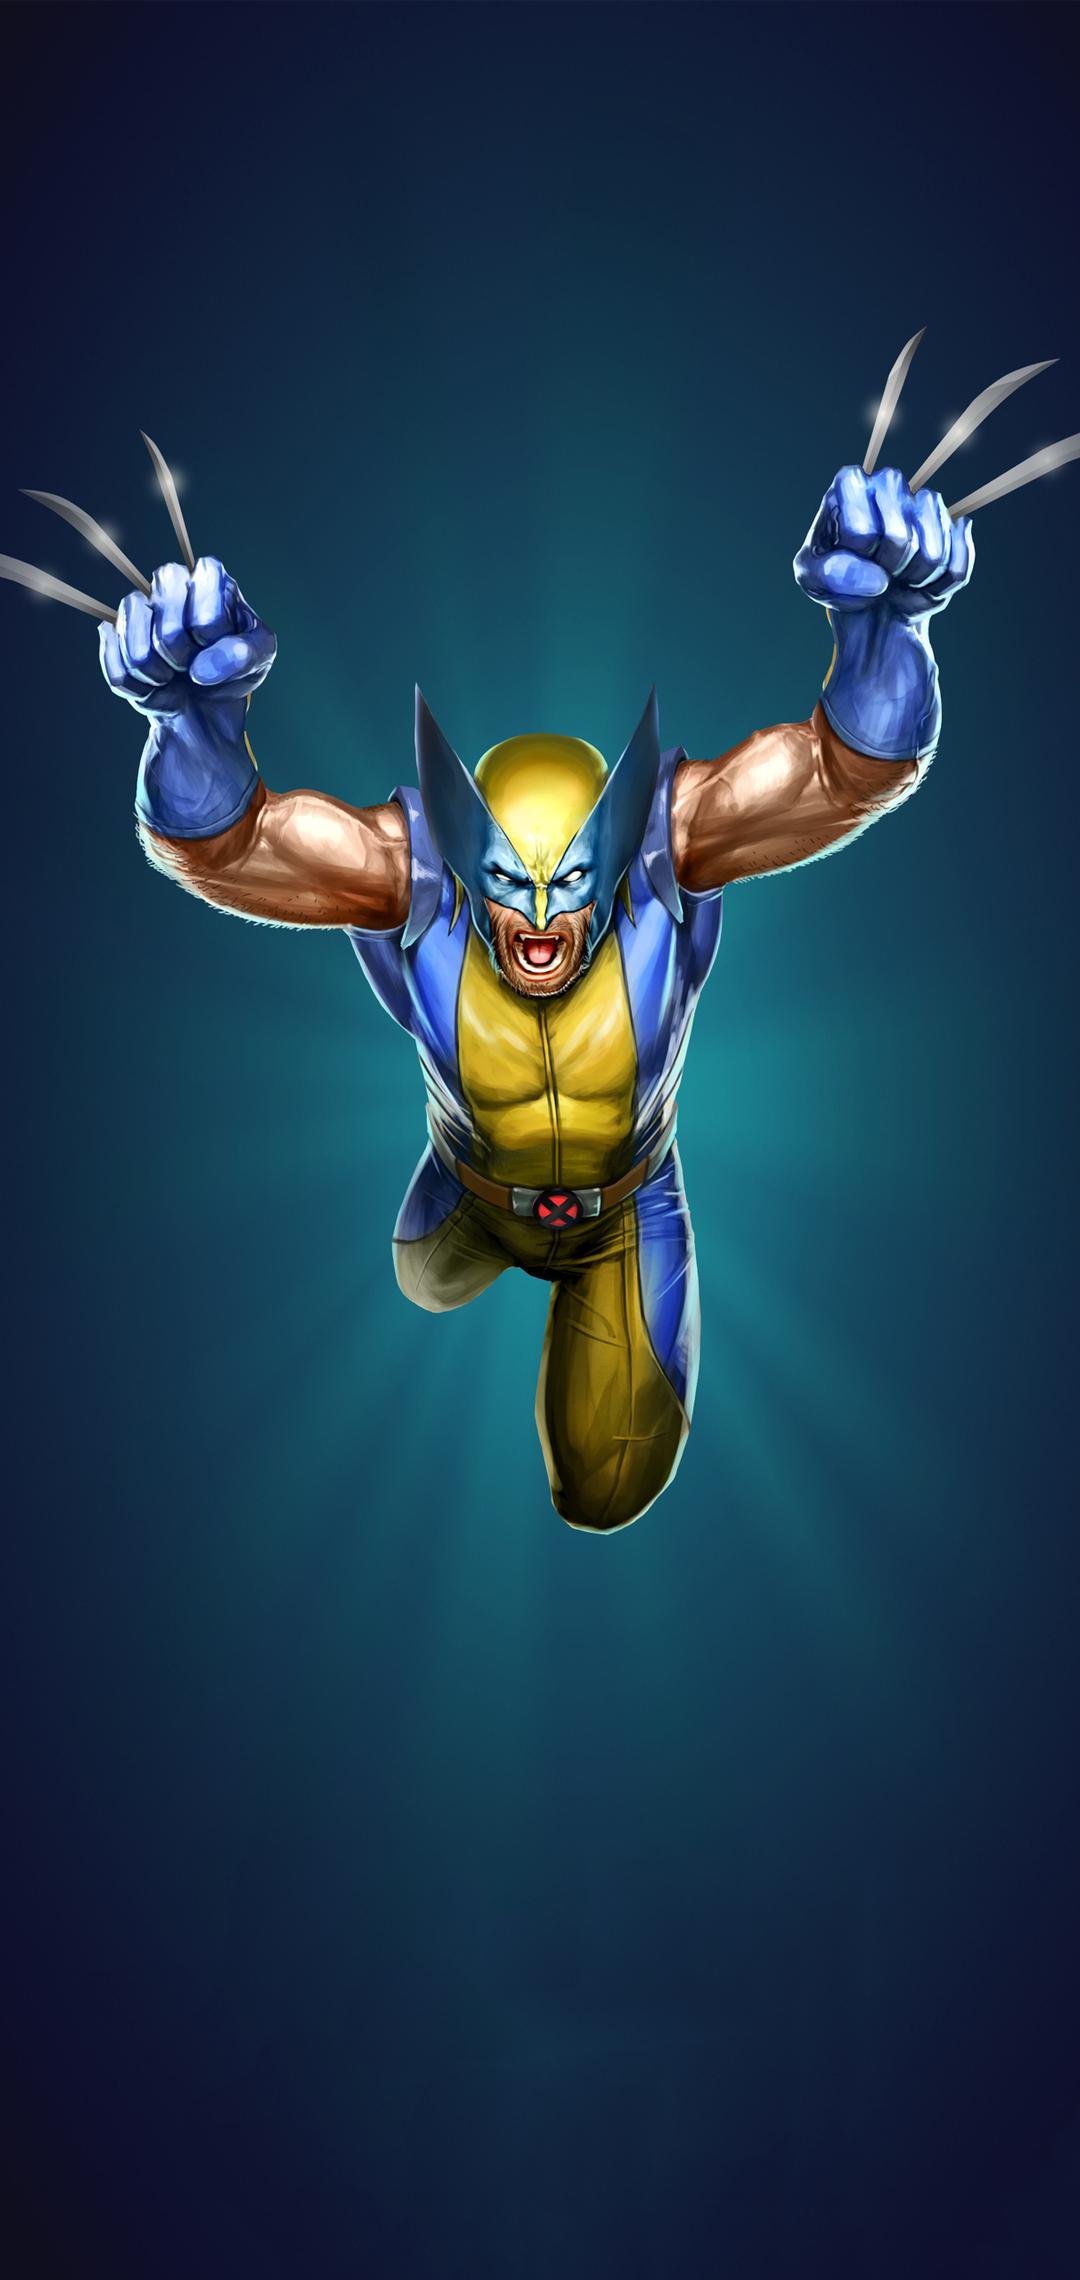 the-wolverine-marvel-artwork-cw.jpg